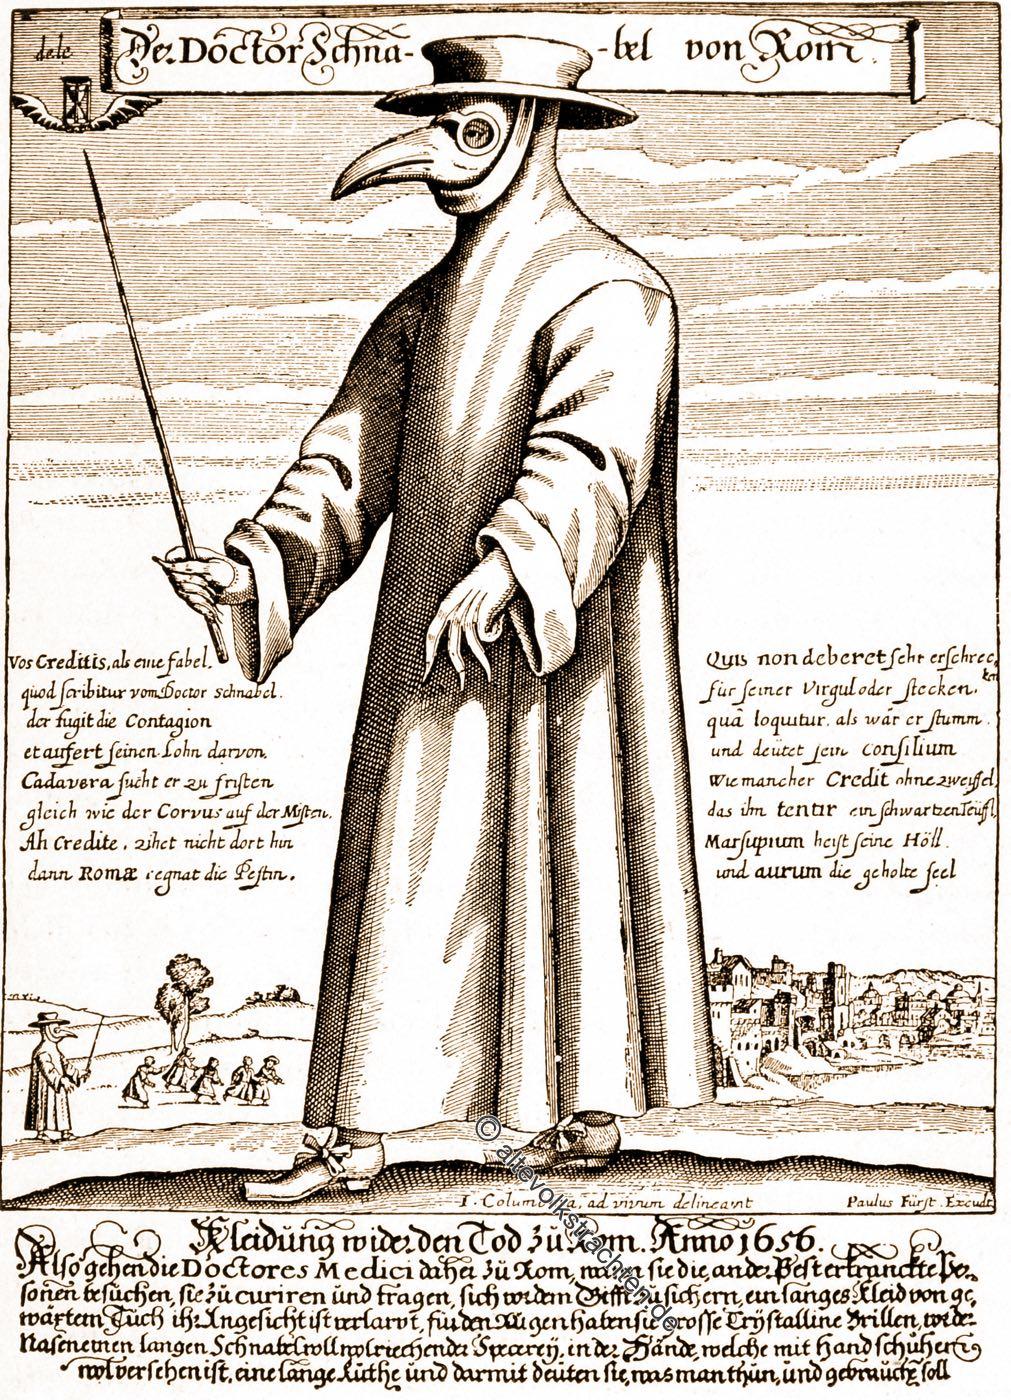 Pestarzt, Pestdoktor, Schnabelmaske, Maske, Schutzkleidung, Mediziner, Arzt, Barock, Renaissance